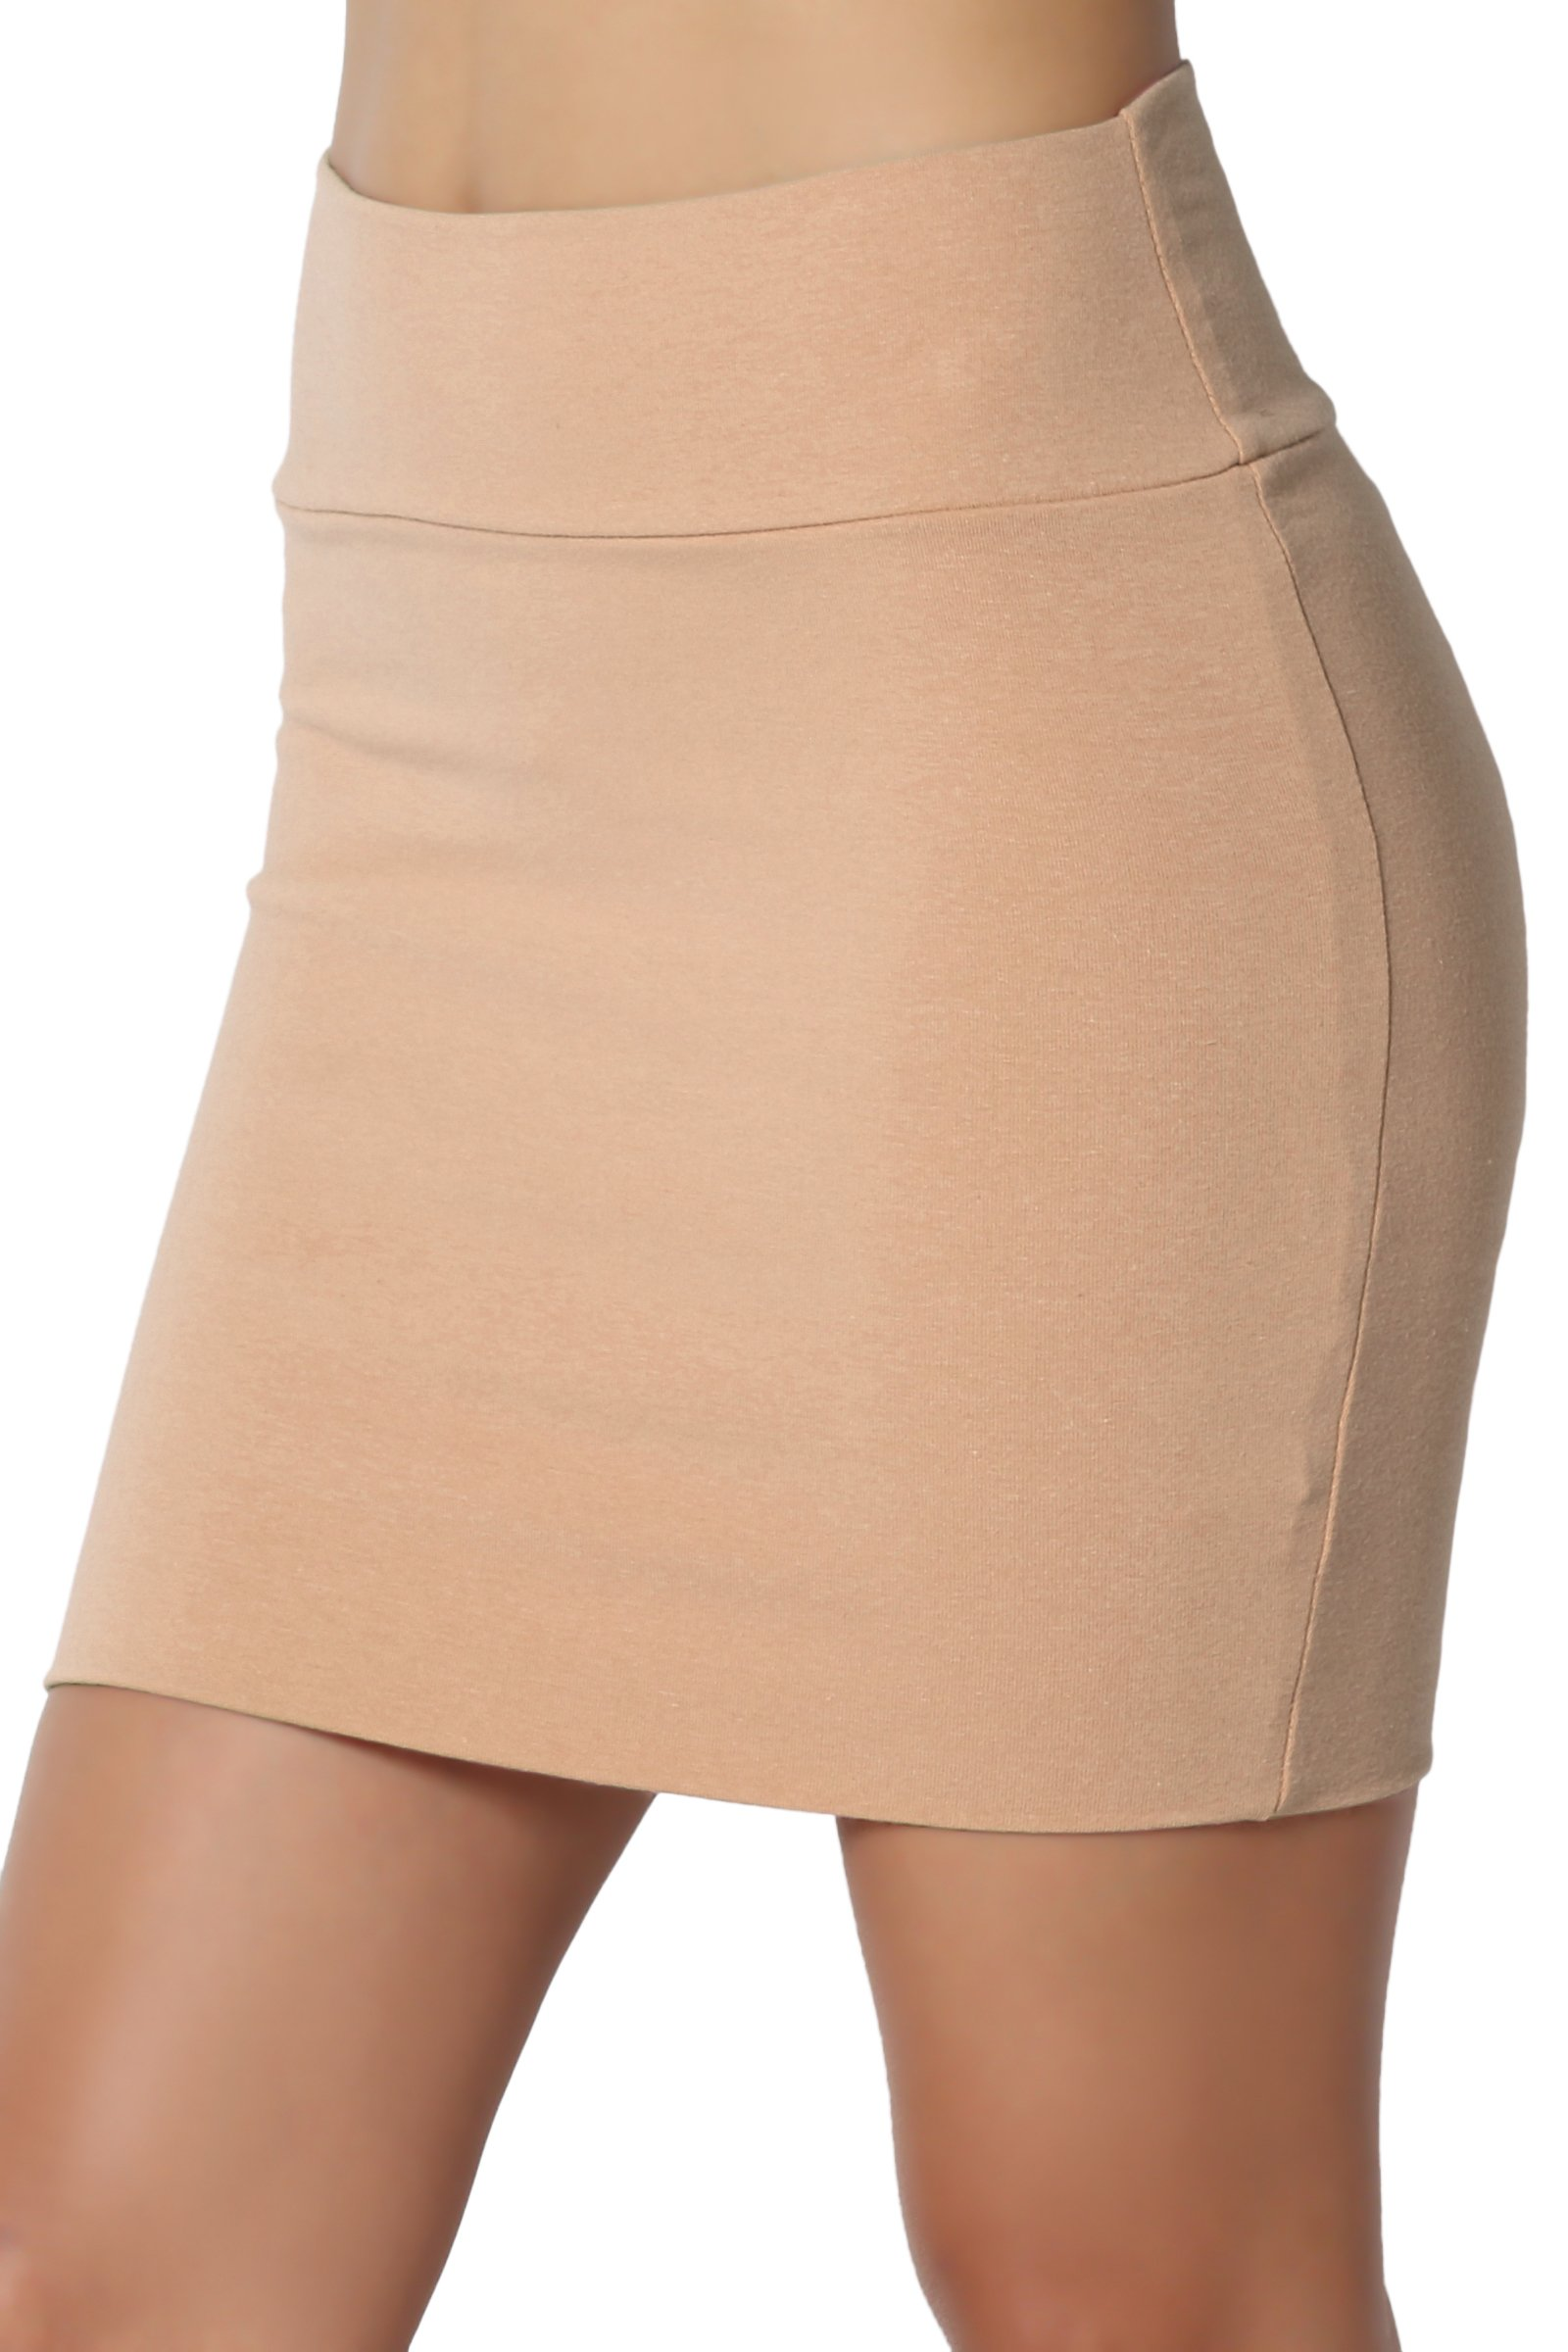 TheMogan Junior's Stretch Cotton Jersey Lined Bodycon Tube Mini Skirt Khaki L